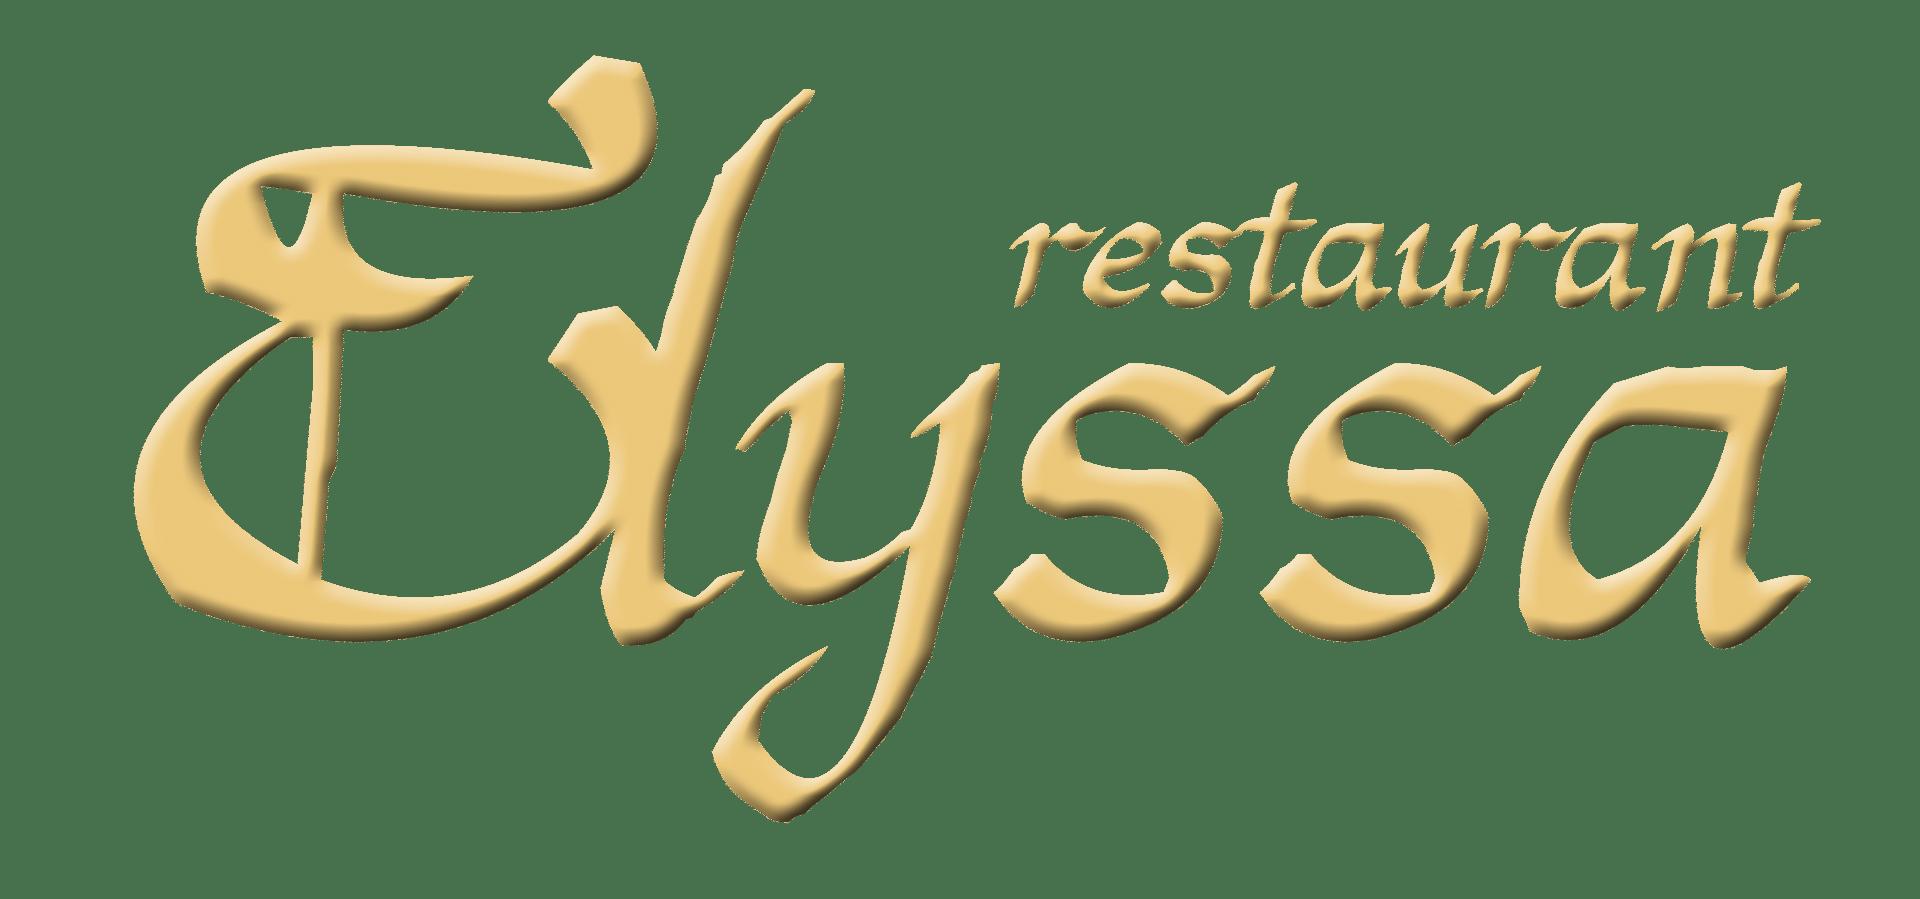 Chez Elyssa